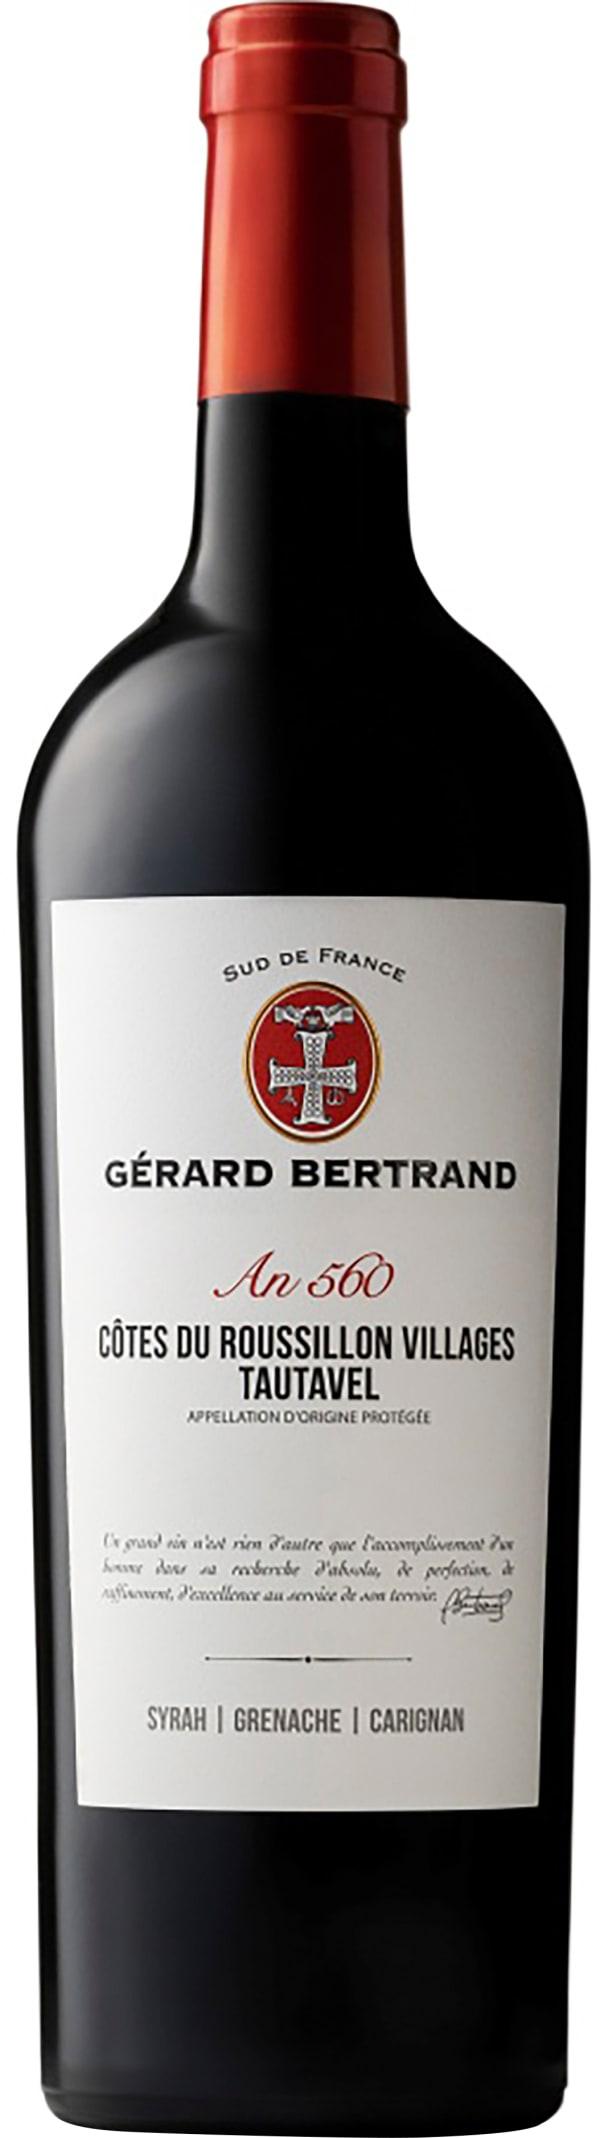 Gérard Bertrand Grand Terroir Tautavel 2016